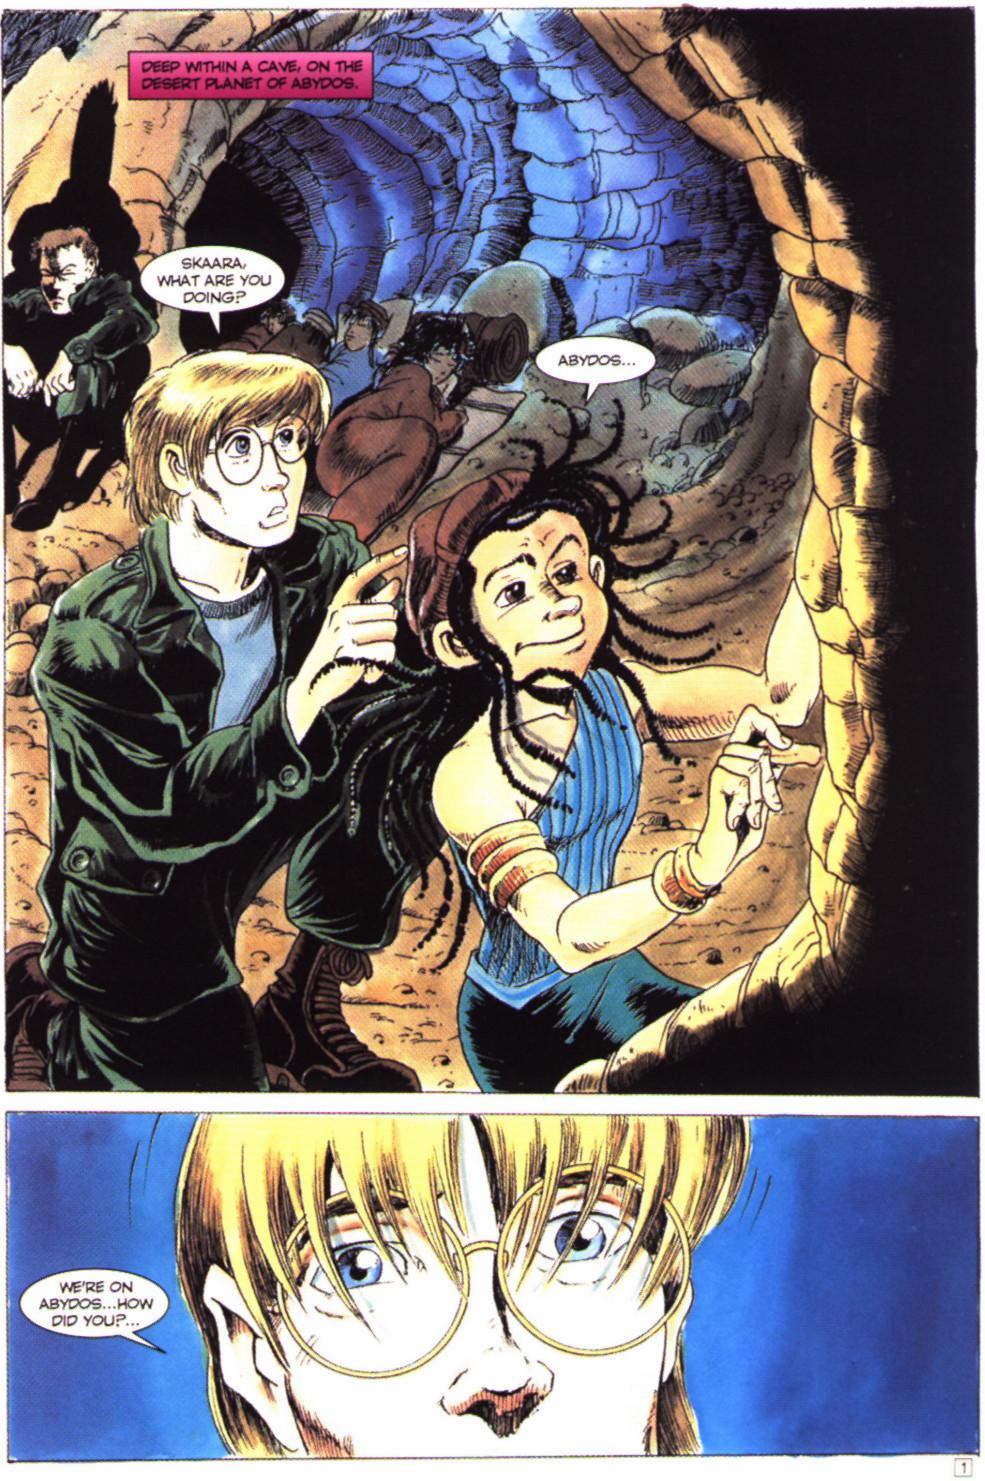 Read online Stargate comic -  Issue #4 - 3